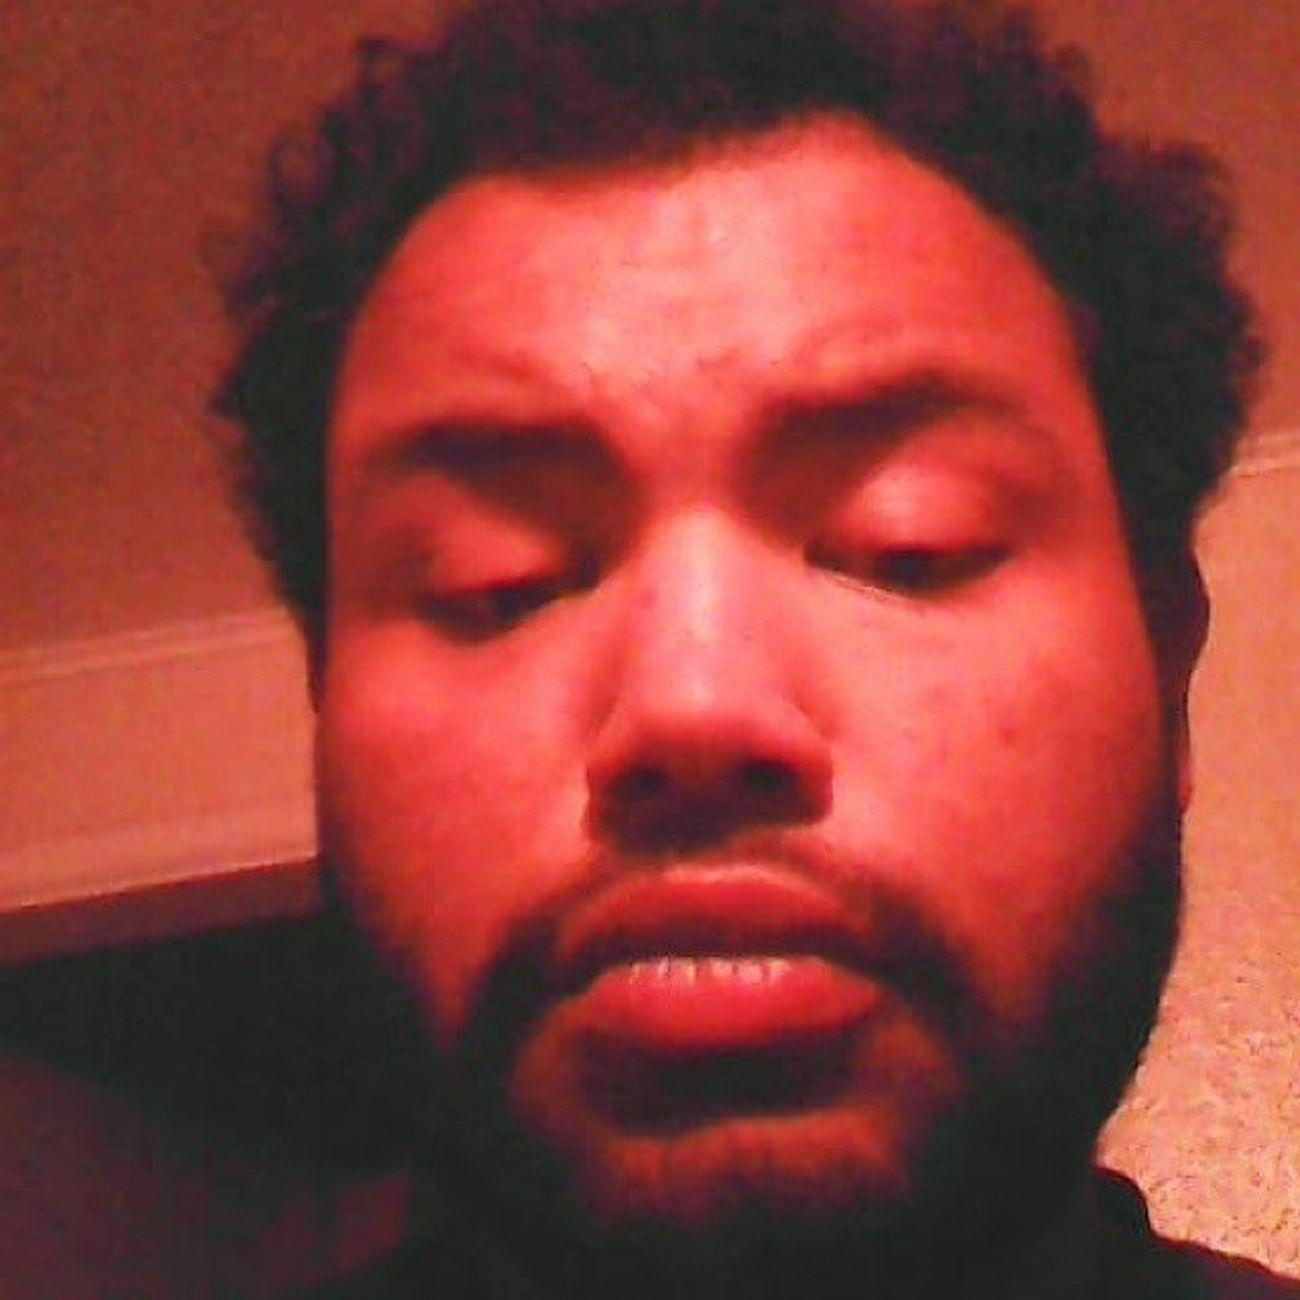 My ugly self after no shave November FacialHair Beardsmakemenmen Travelingonclouds